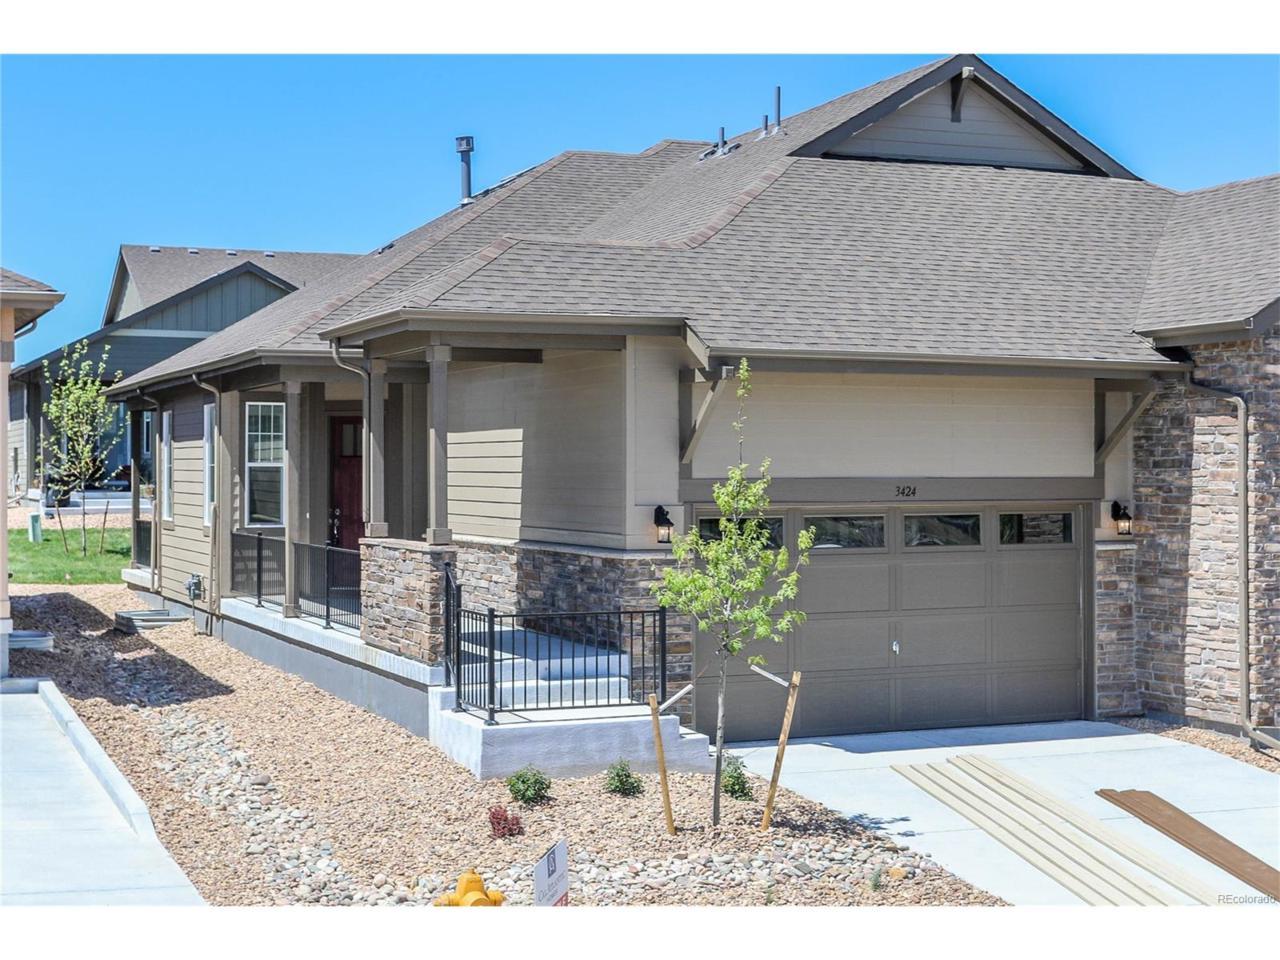 3424 New Haven Circle, Castle Rock, CO 80109 (MLS #5455554) :: 8z Real Estate